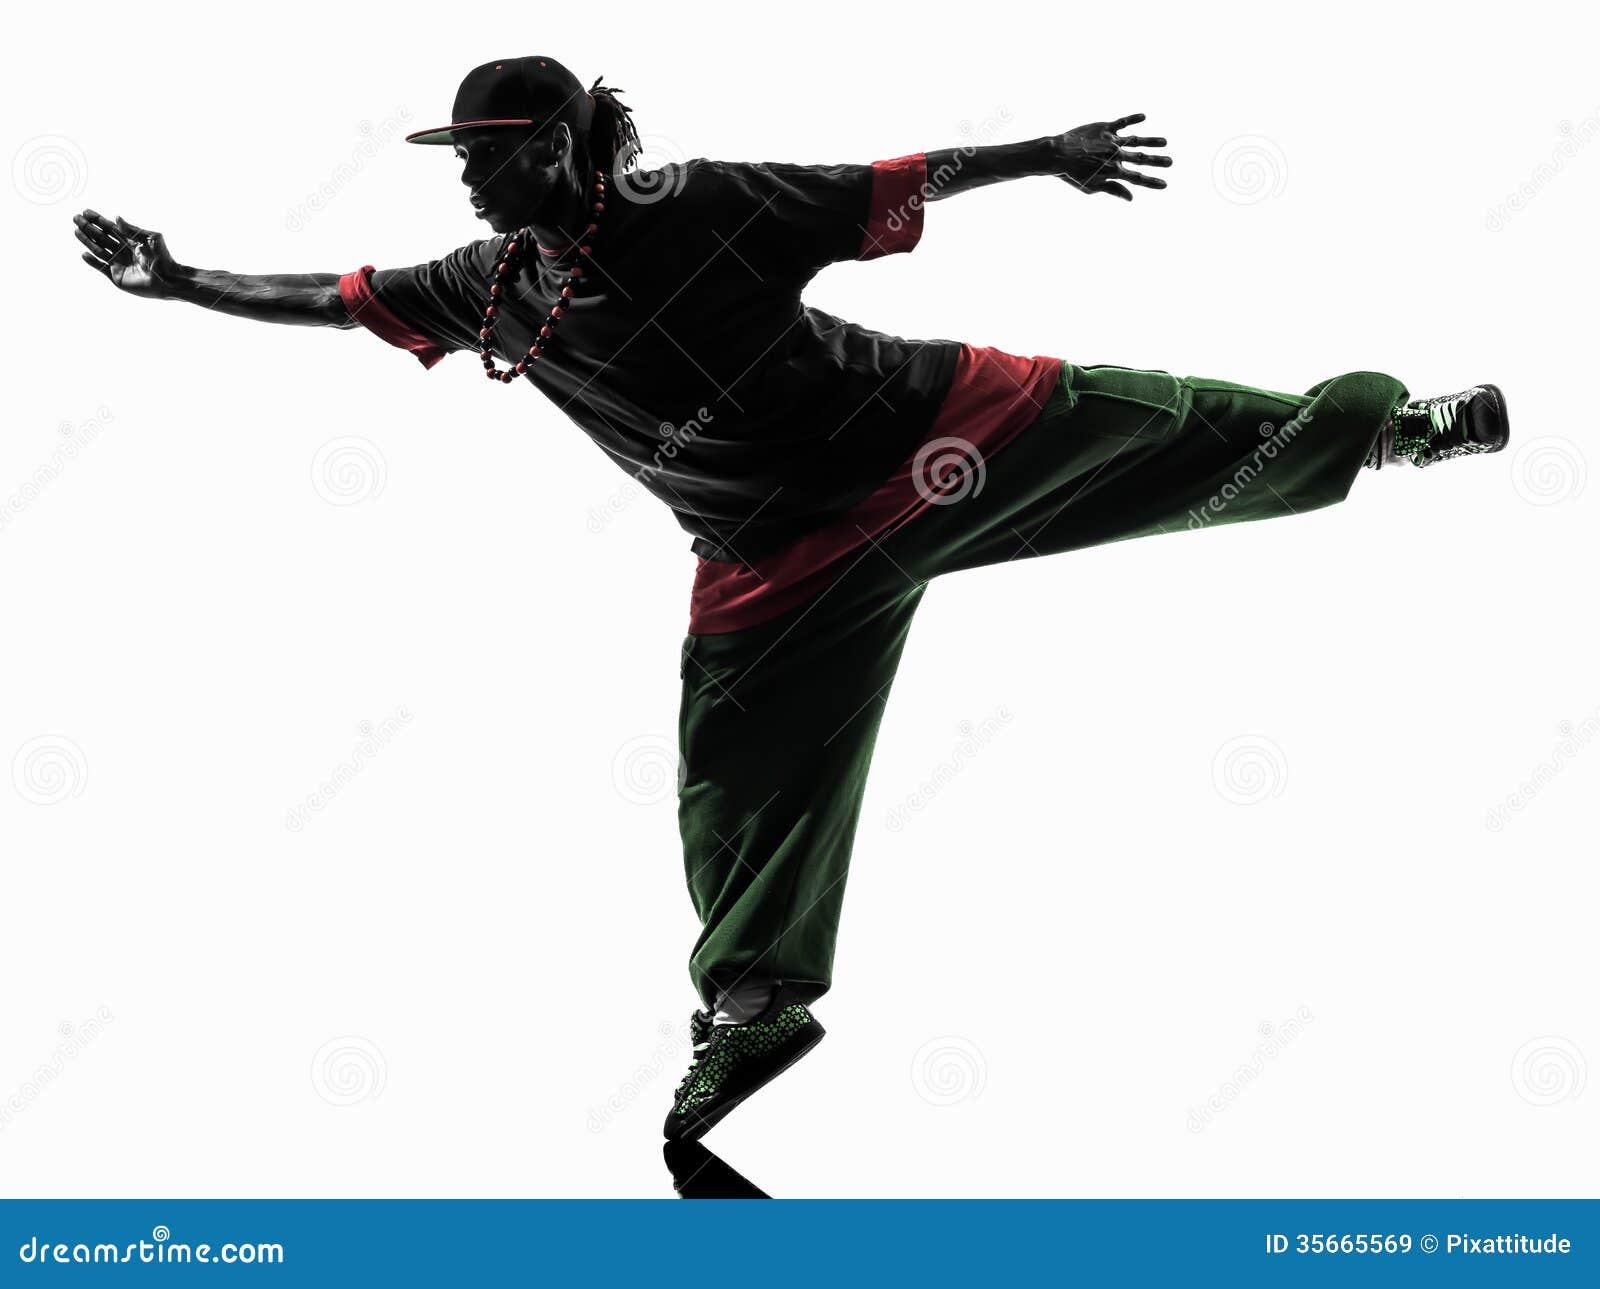 90ae3f48c Royalty-Free Stock Photo. Hip hop acrobatic break dancer breakdancing young  man silhouette